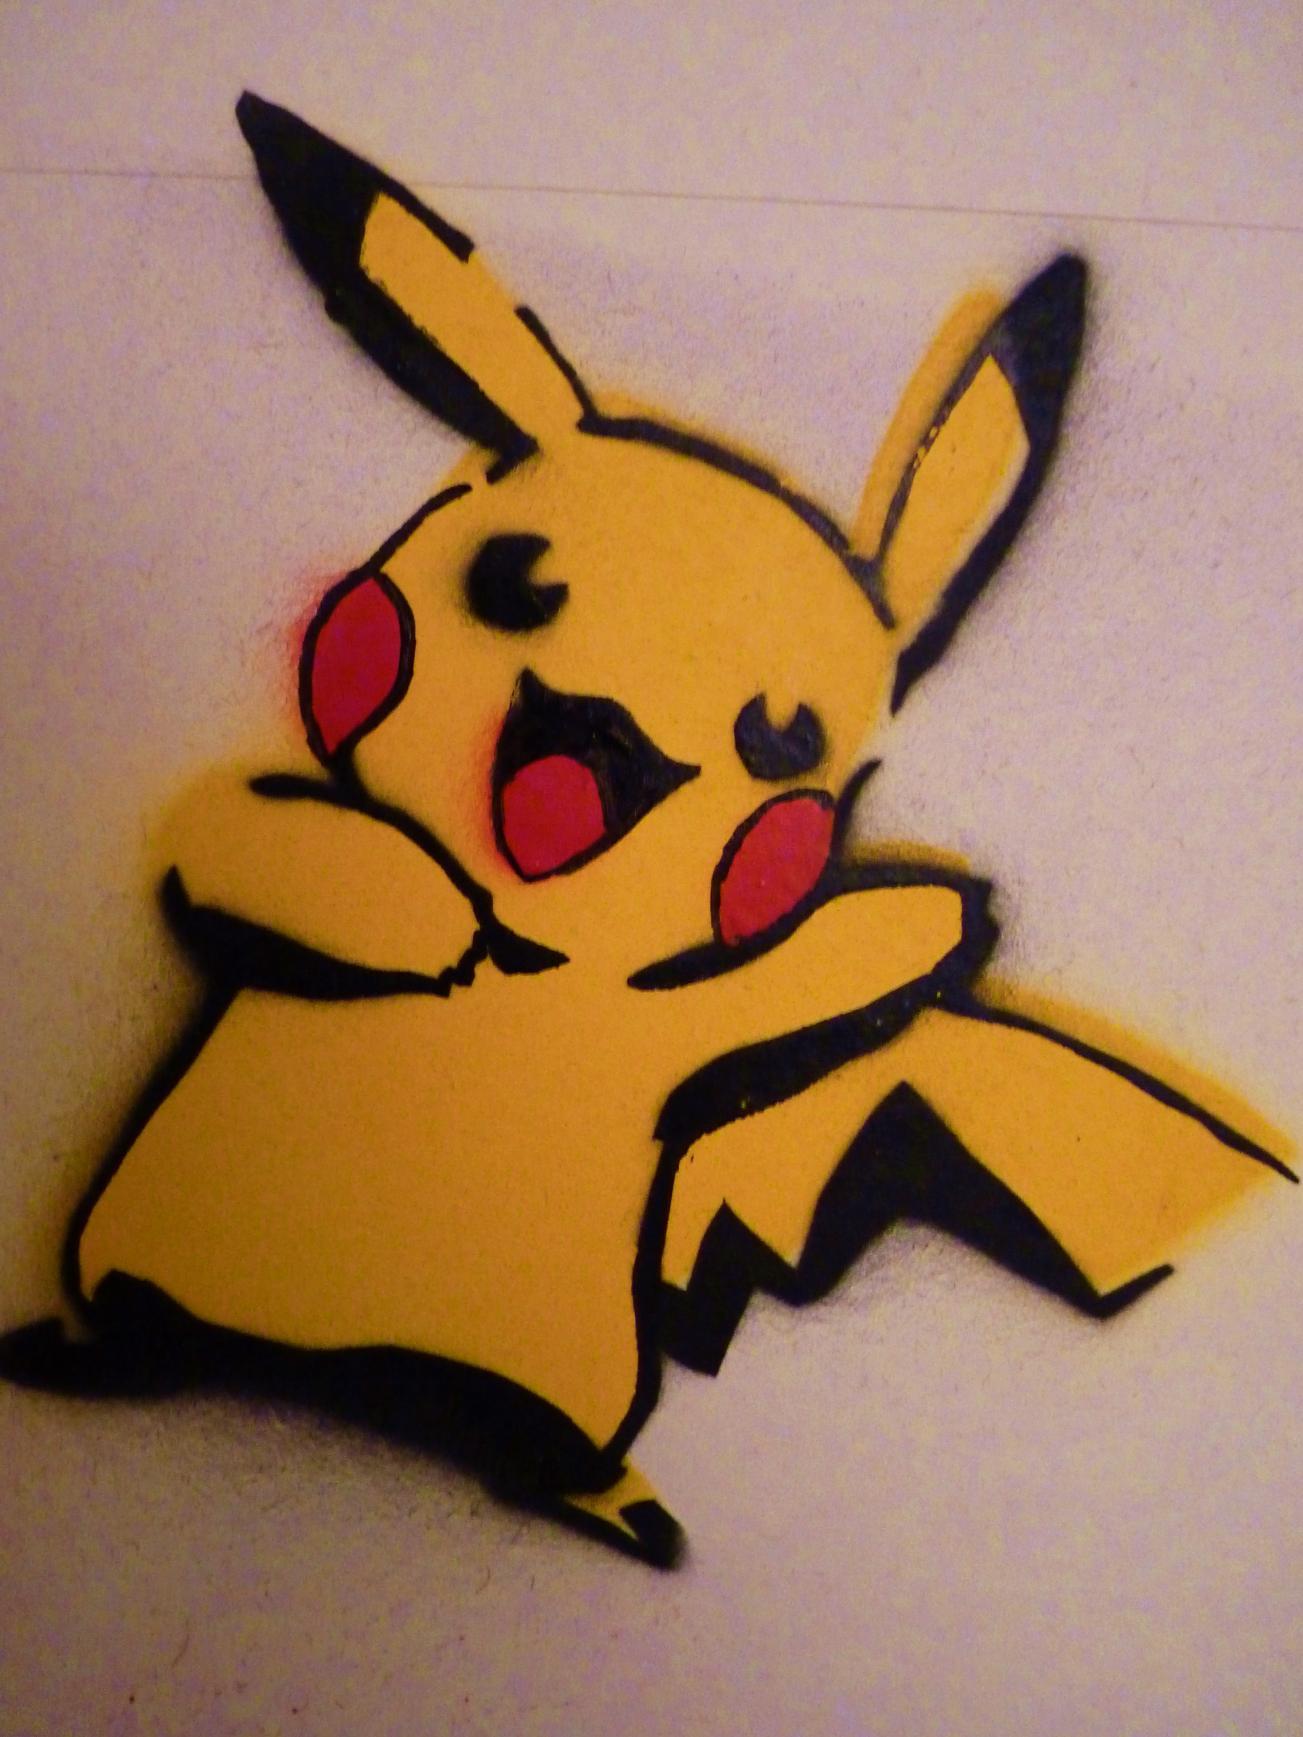 pikachu_stencil_by_jomobro-d3ailwu.jpg